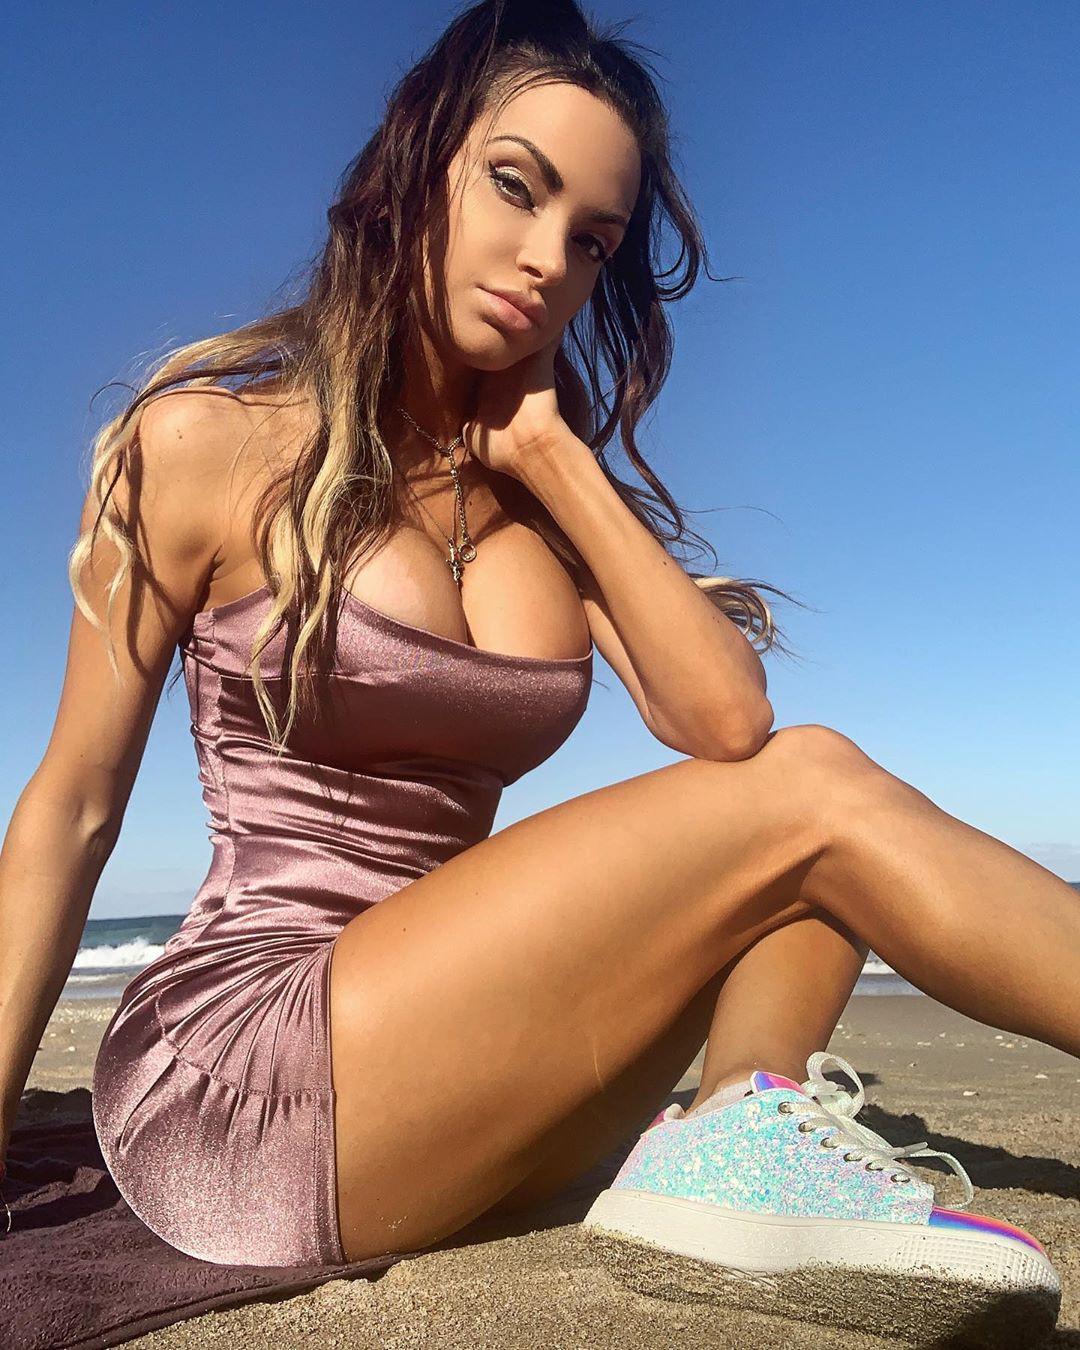 Nienna Jade bikini classy outfit, instagram photoshoot, fashion photography